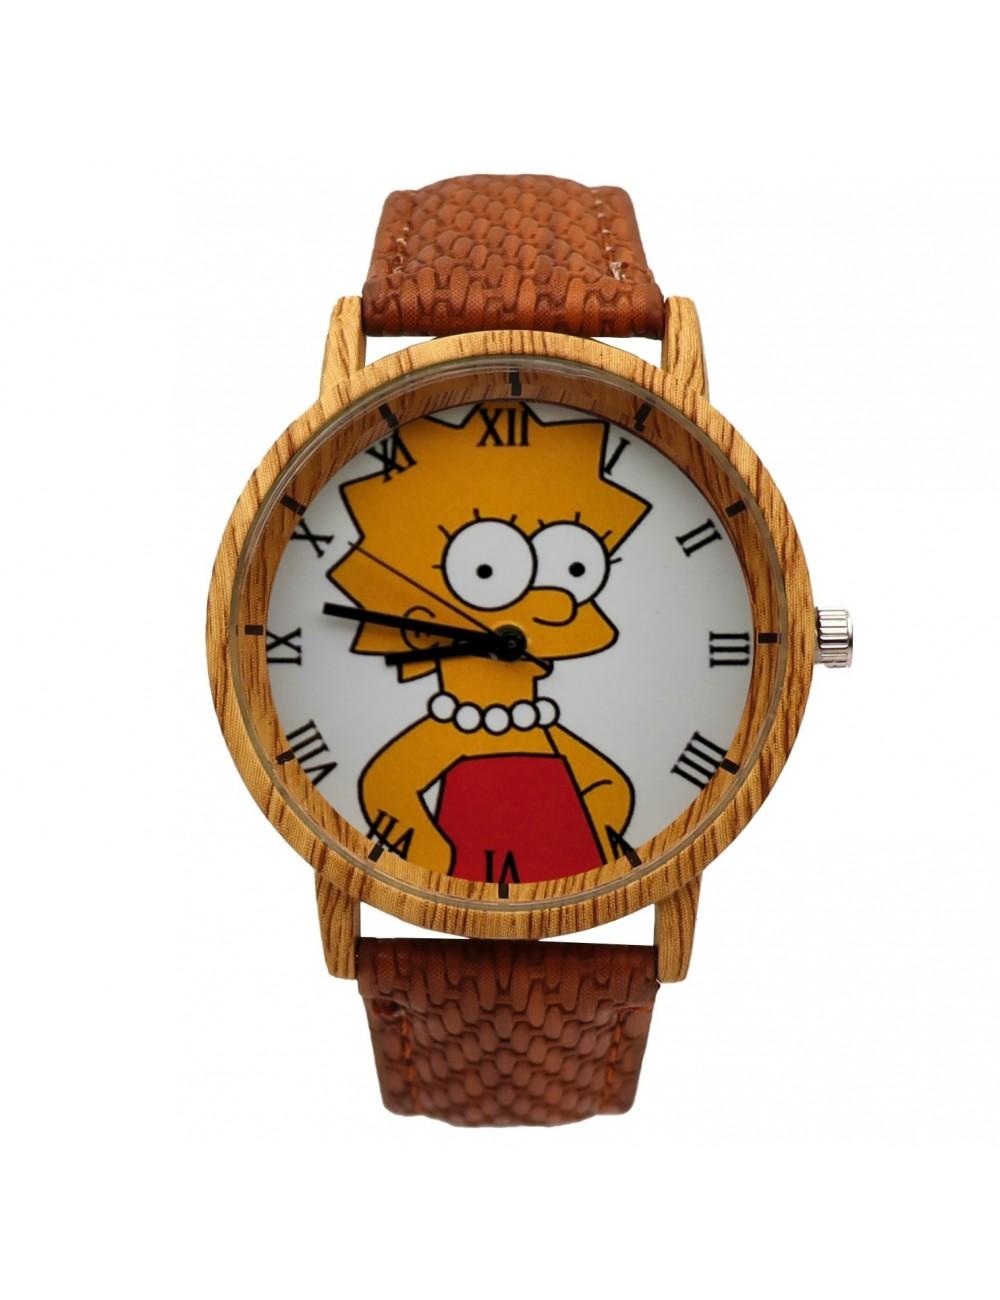 Reloj Lisa Dayoshop $41.900